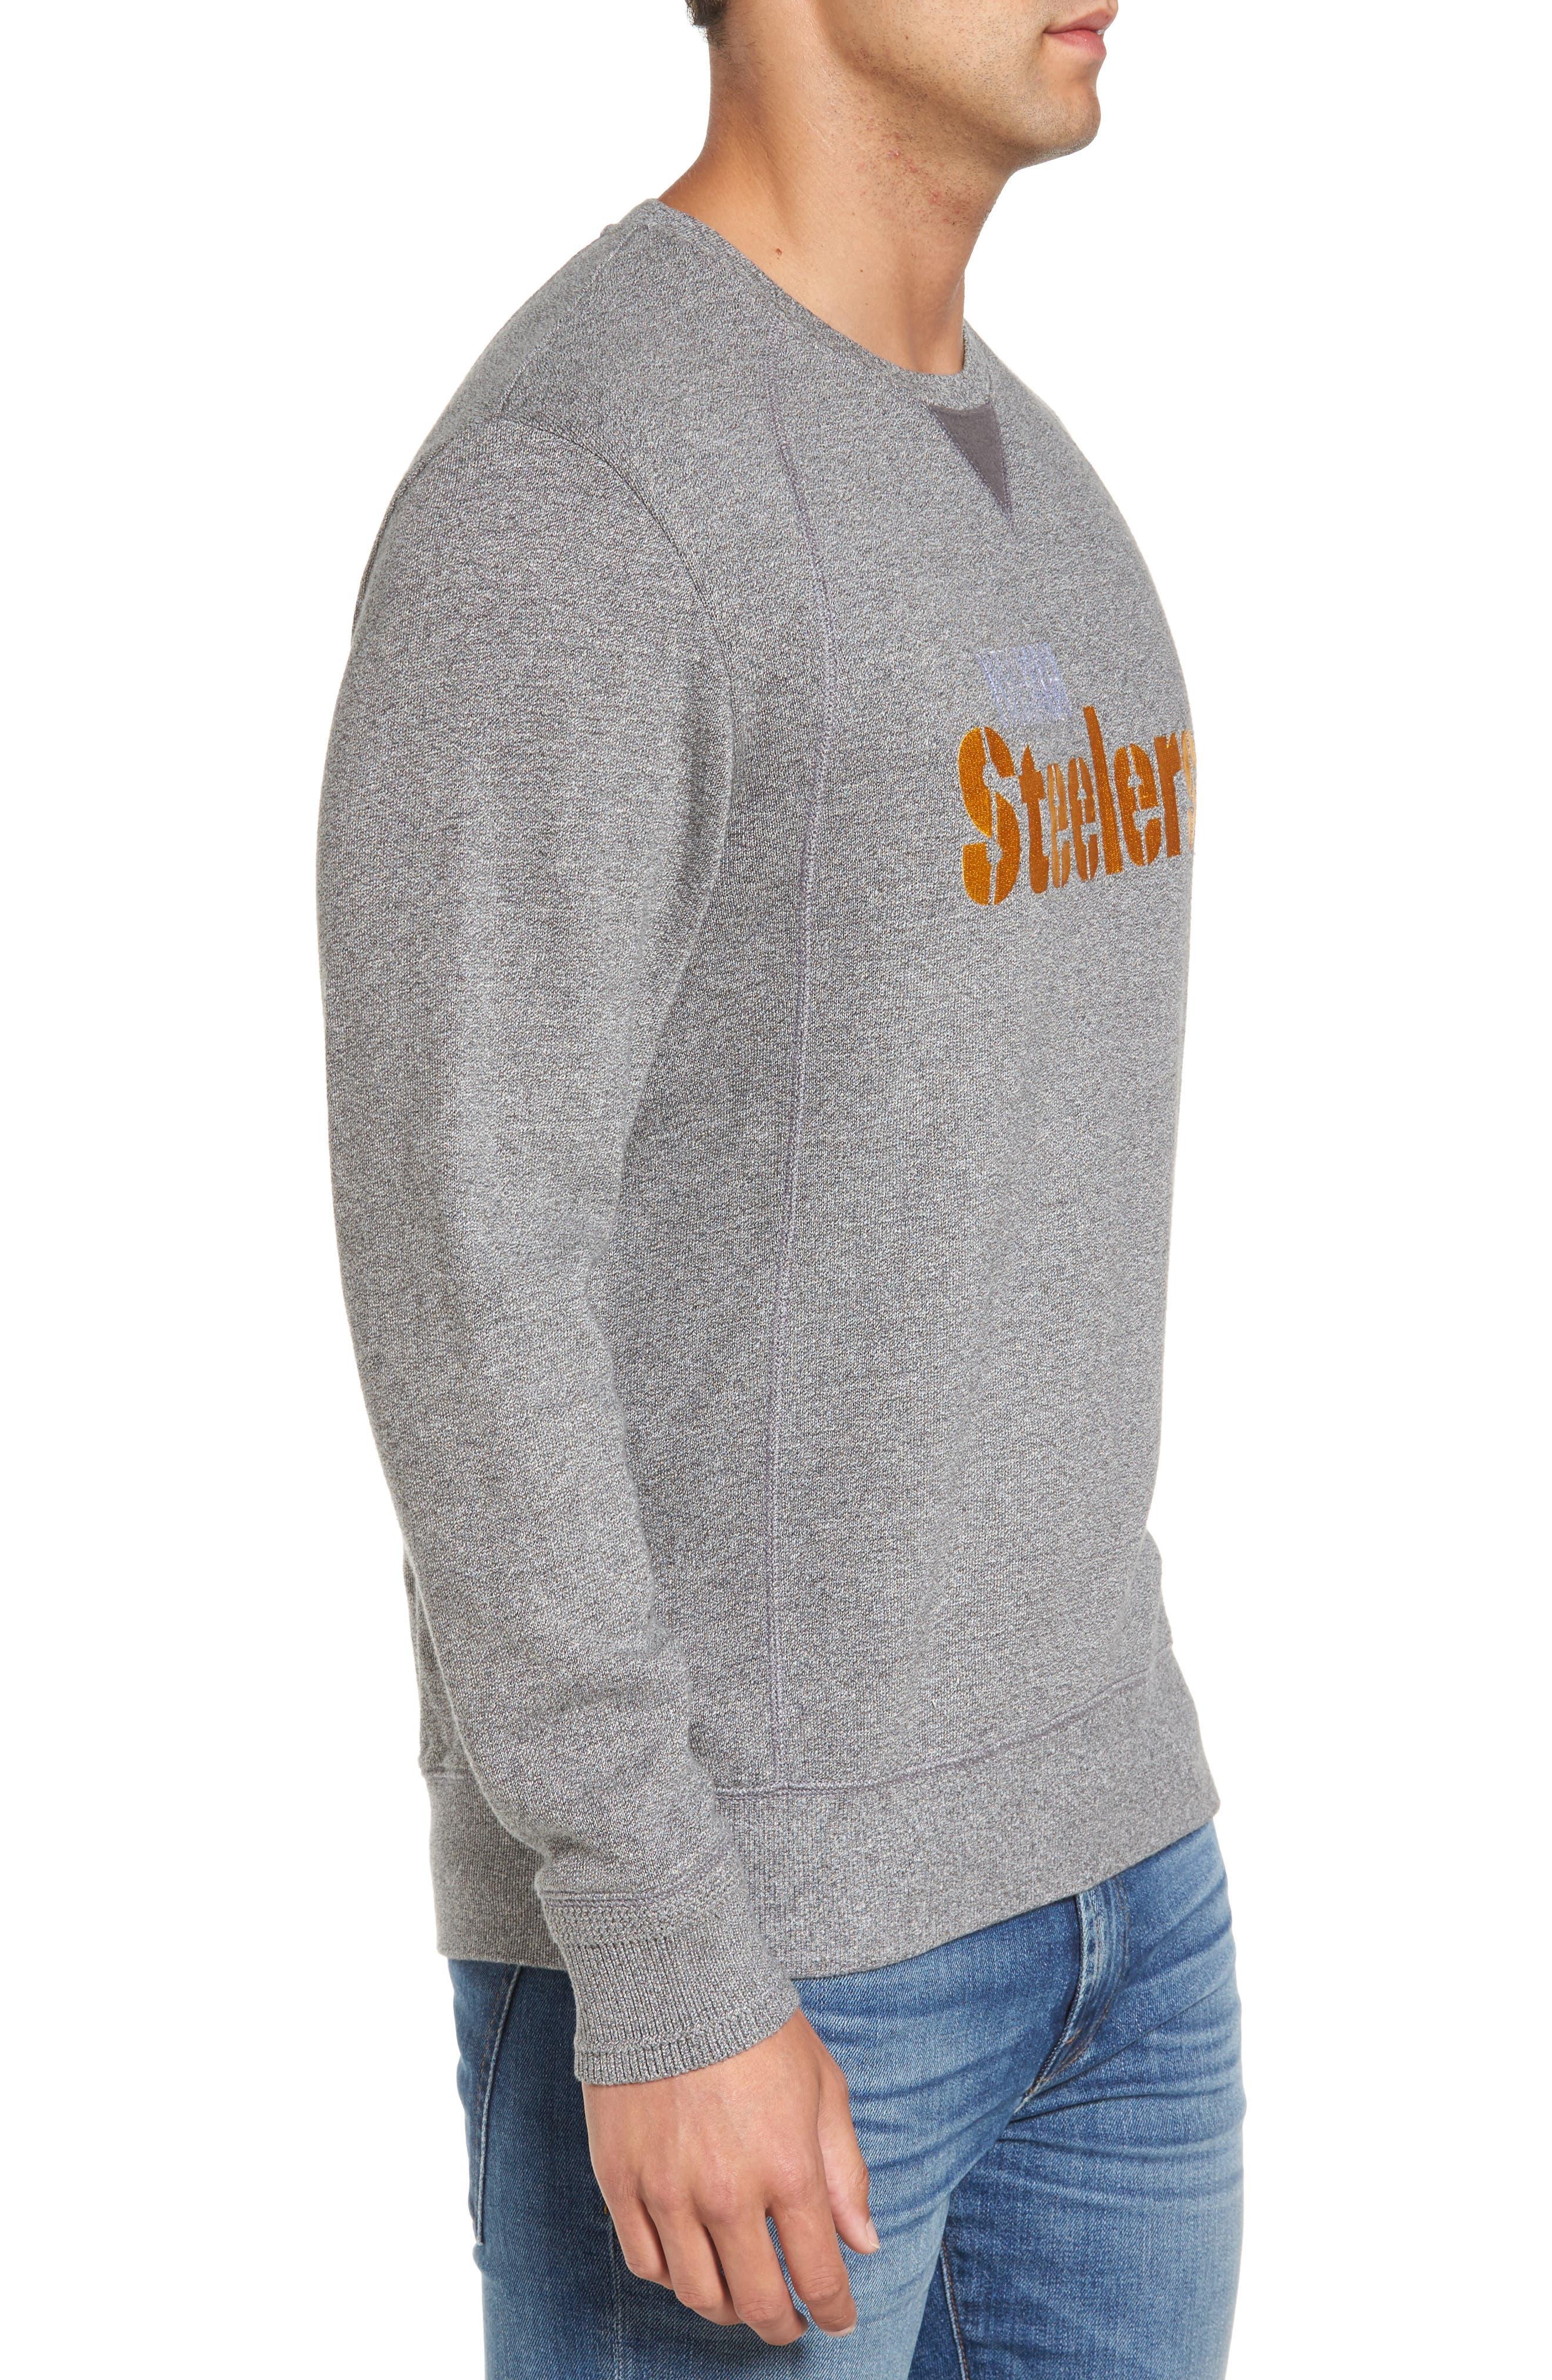 NFL Stitch of Liberty Embroidered Crewneck Sweatshirt,                             Alternate thumbnail 89, color,